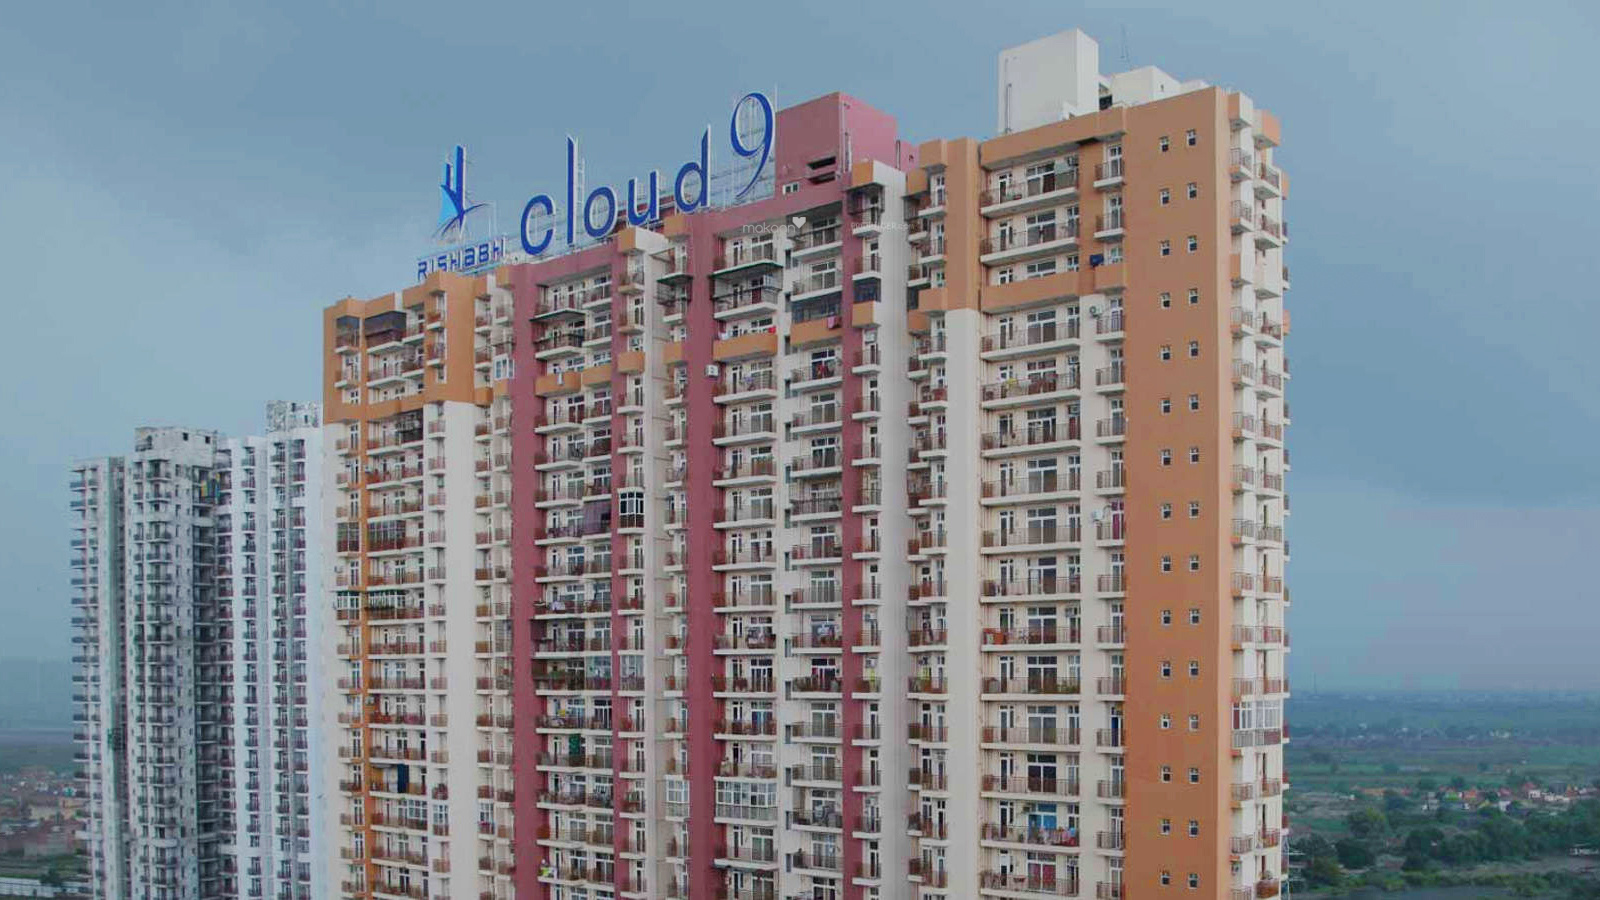 Cloud 9 skylish indirapuram ghaziabad flats in indirapuram price - Affordable Projects In Indirapuram Affordable Residential Projects In Indirapuram